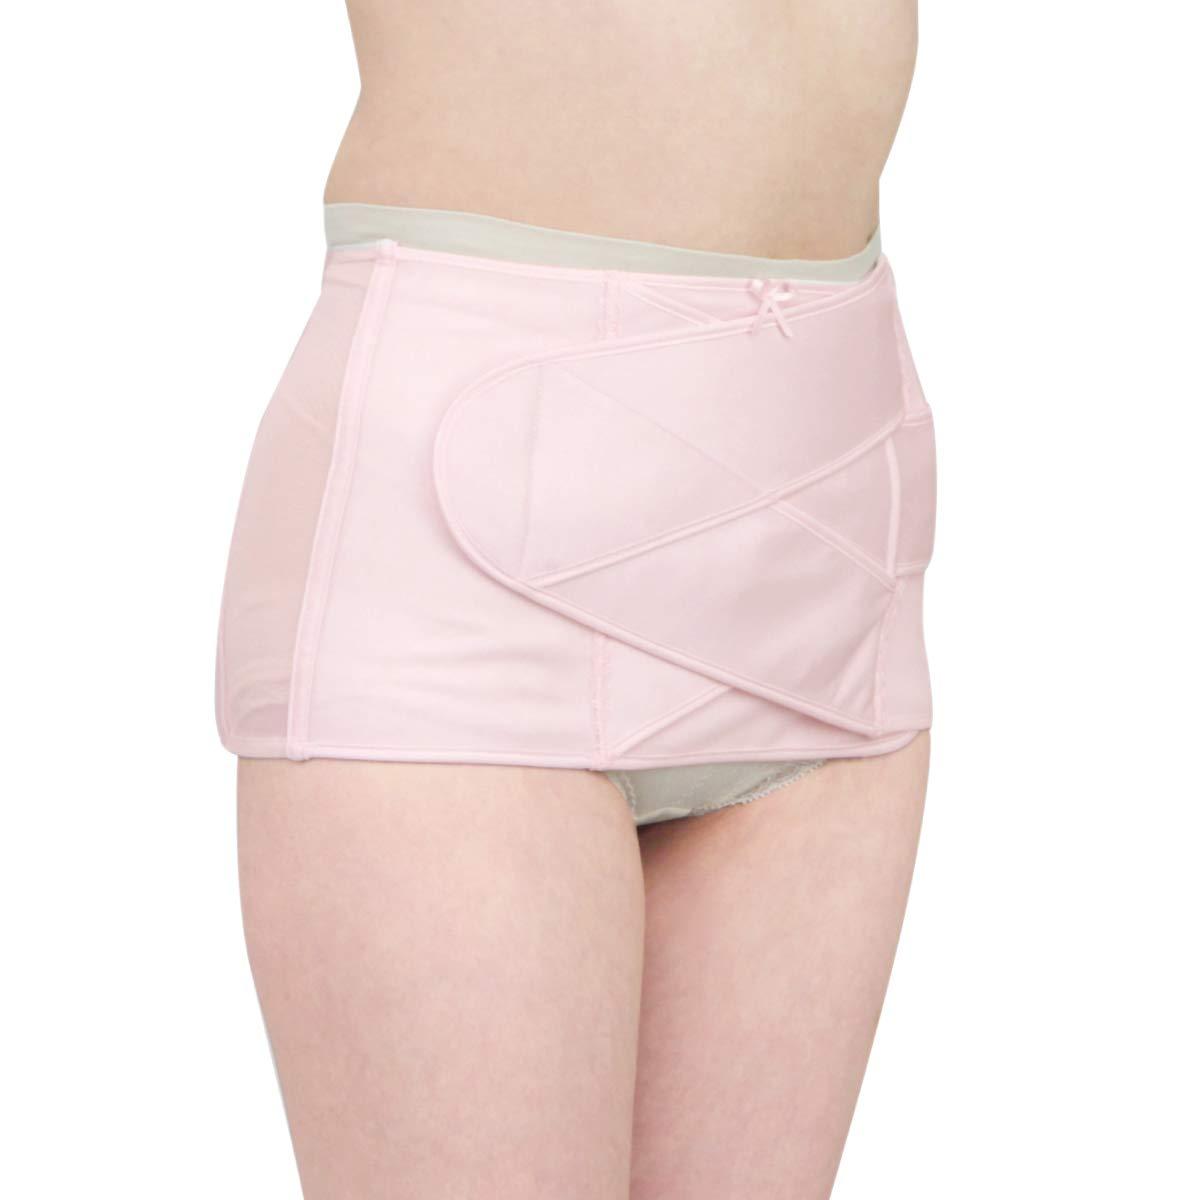 FUN fun Inujirushi Honpo Pregnancy Postpartum Belly Band Pelvis Correction Belt S-3054